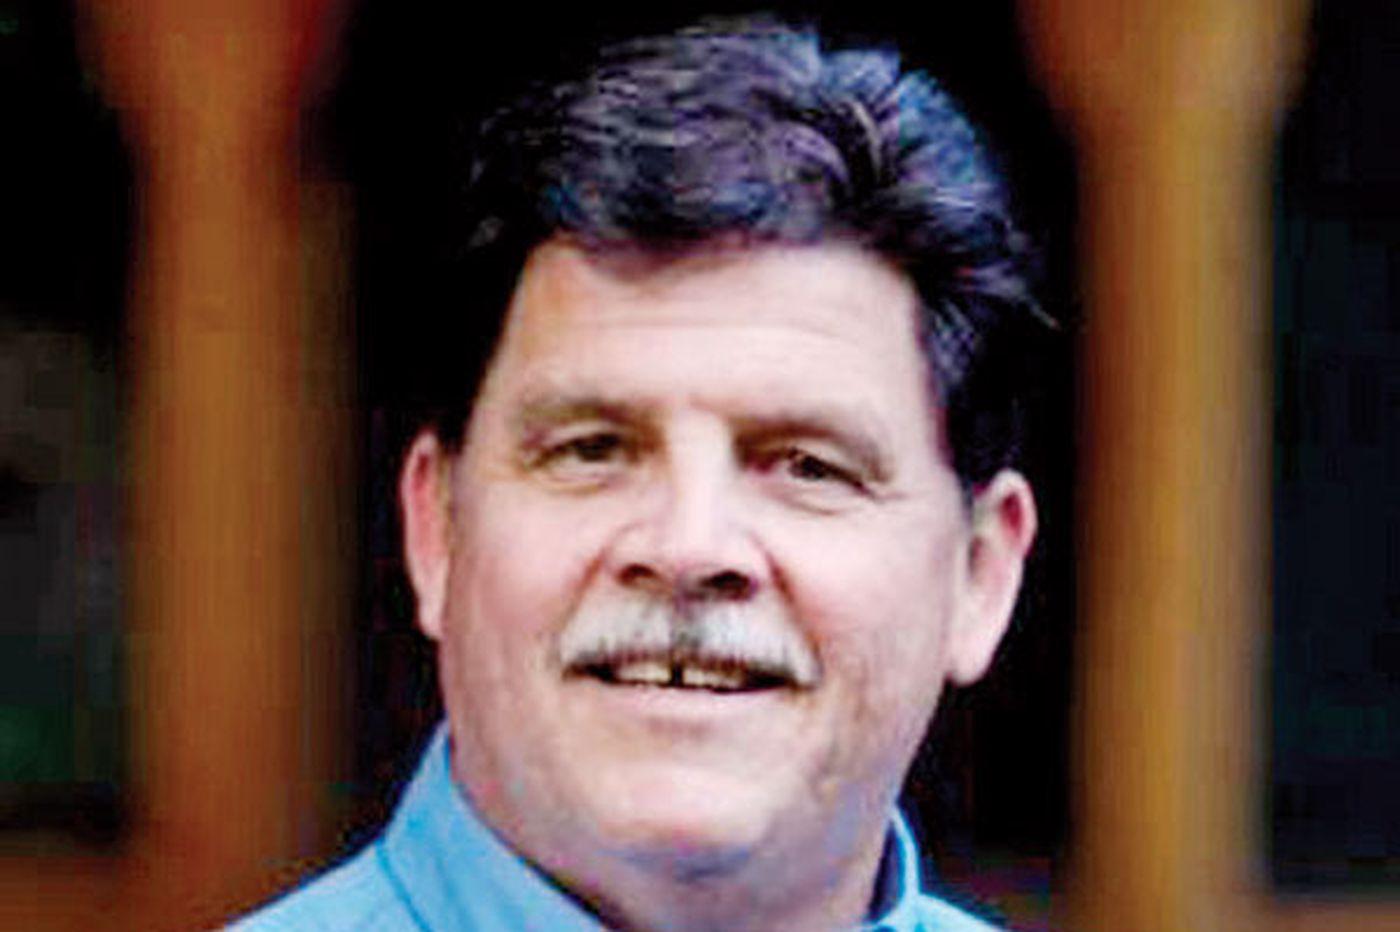 Trump-branded Assemblyman Joe Howarth loses to party regulars in Burlington County primary